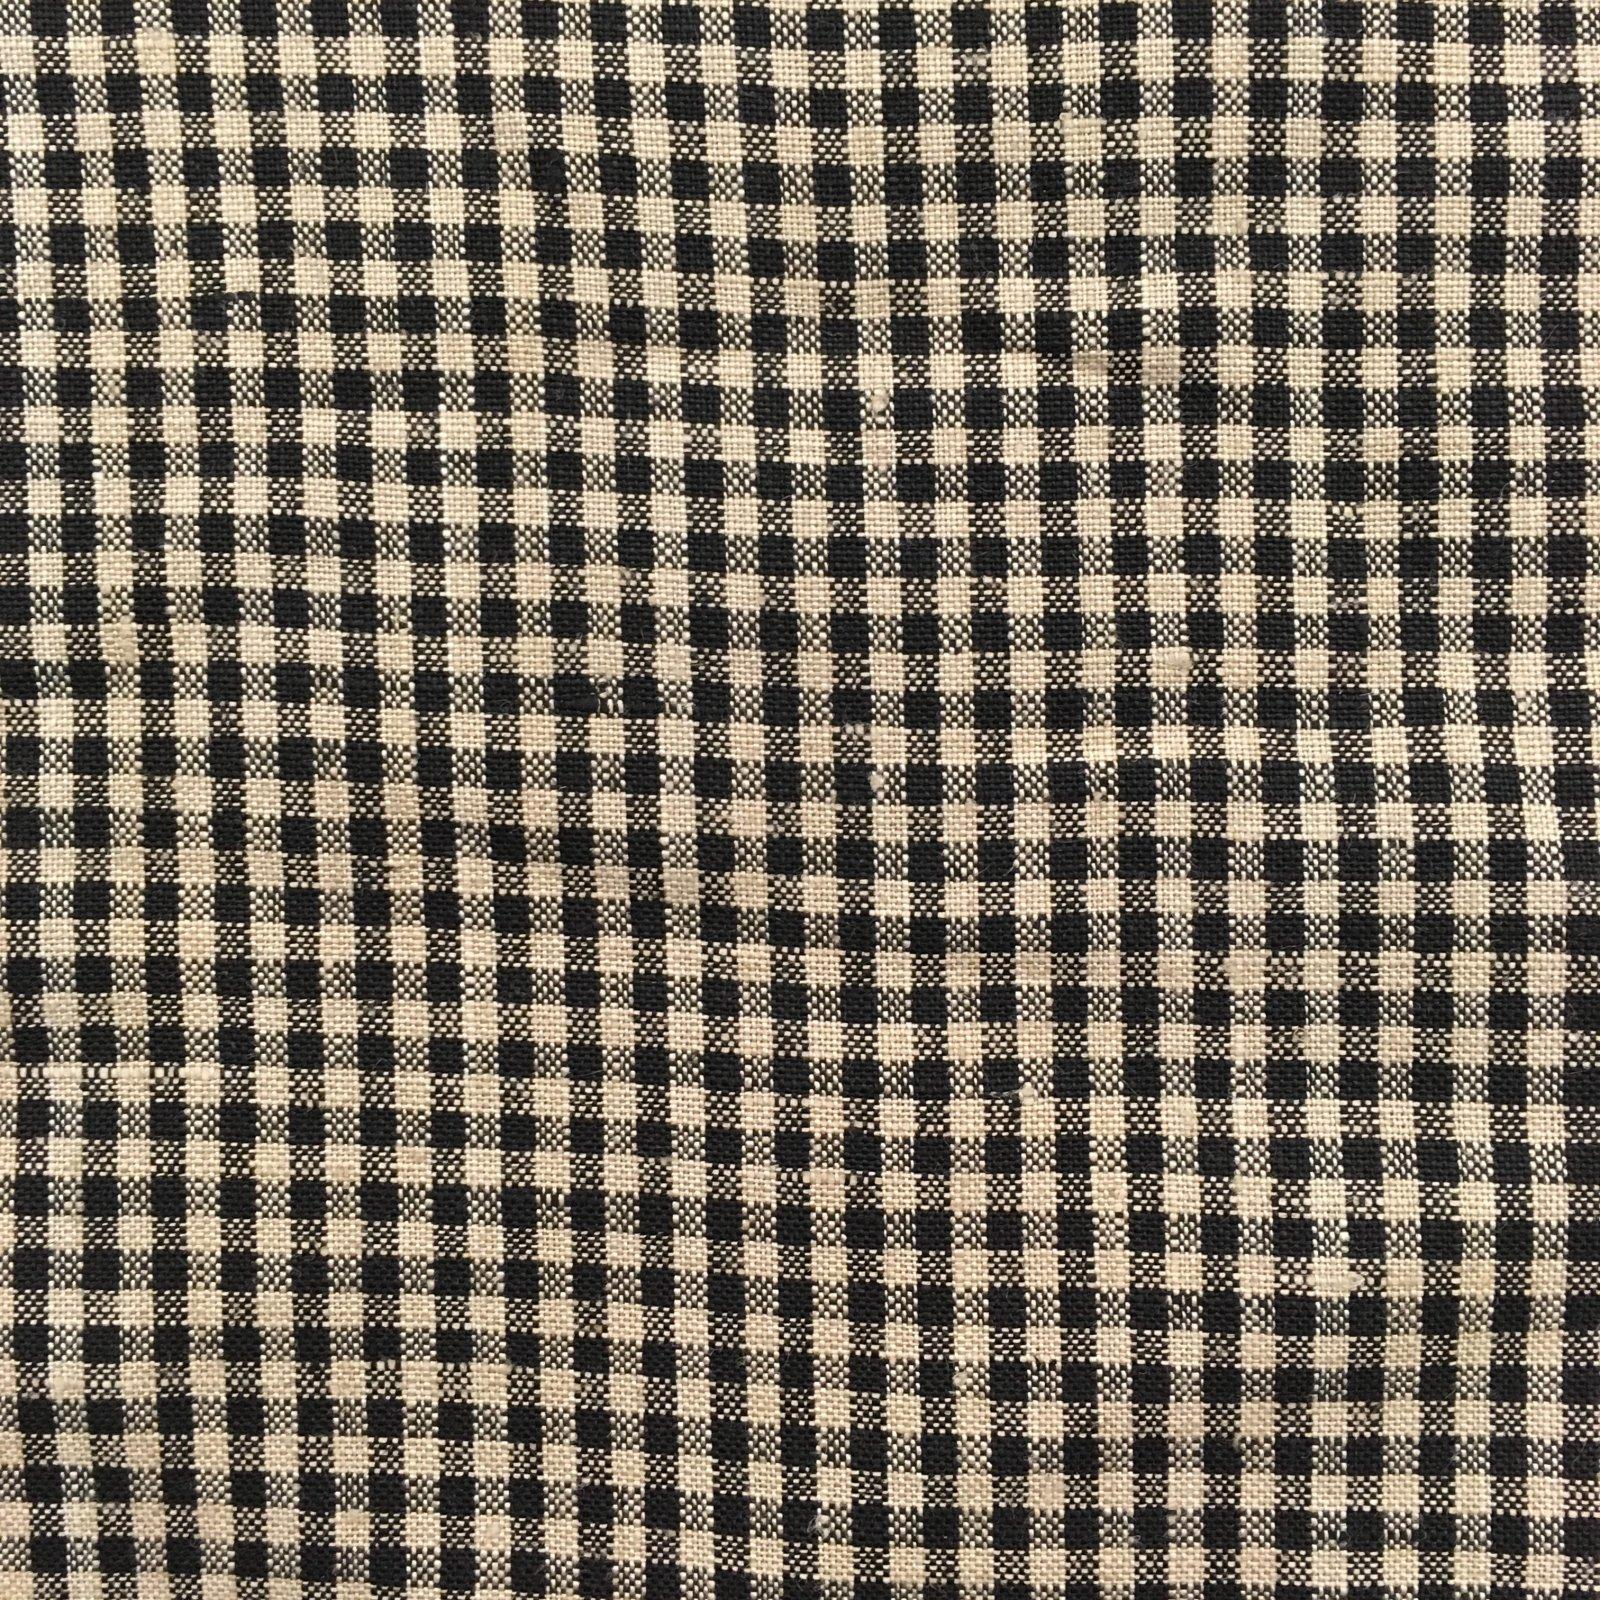 100% Linen - Mini Gingham - Black/Natural